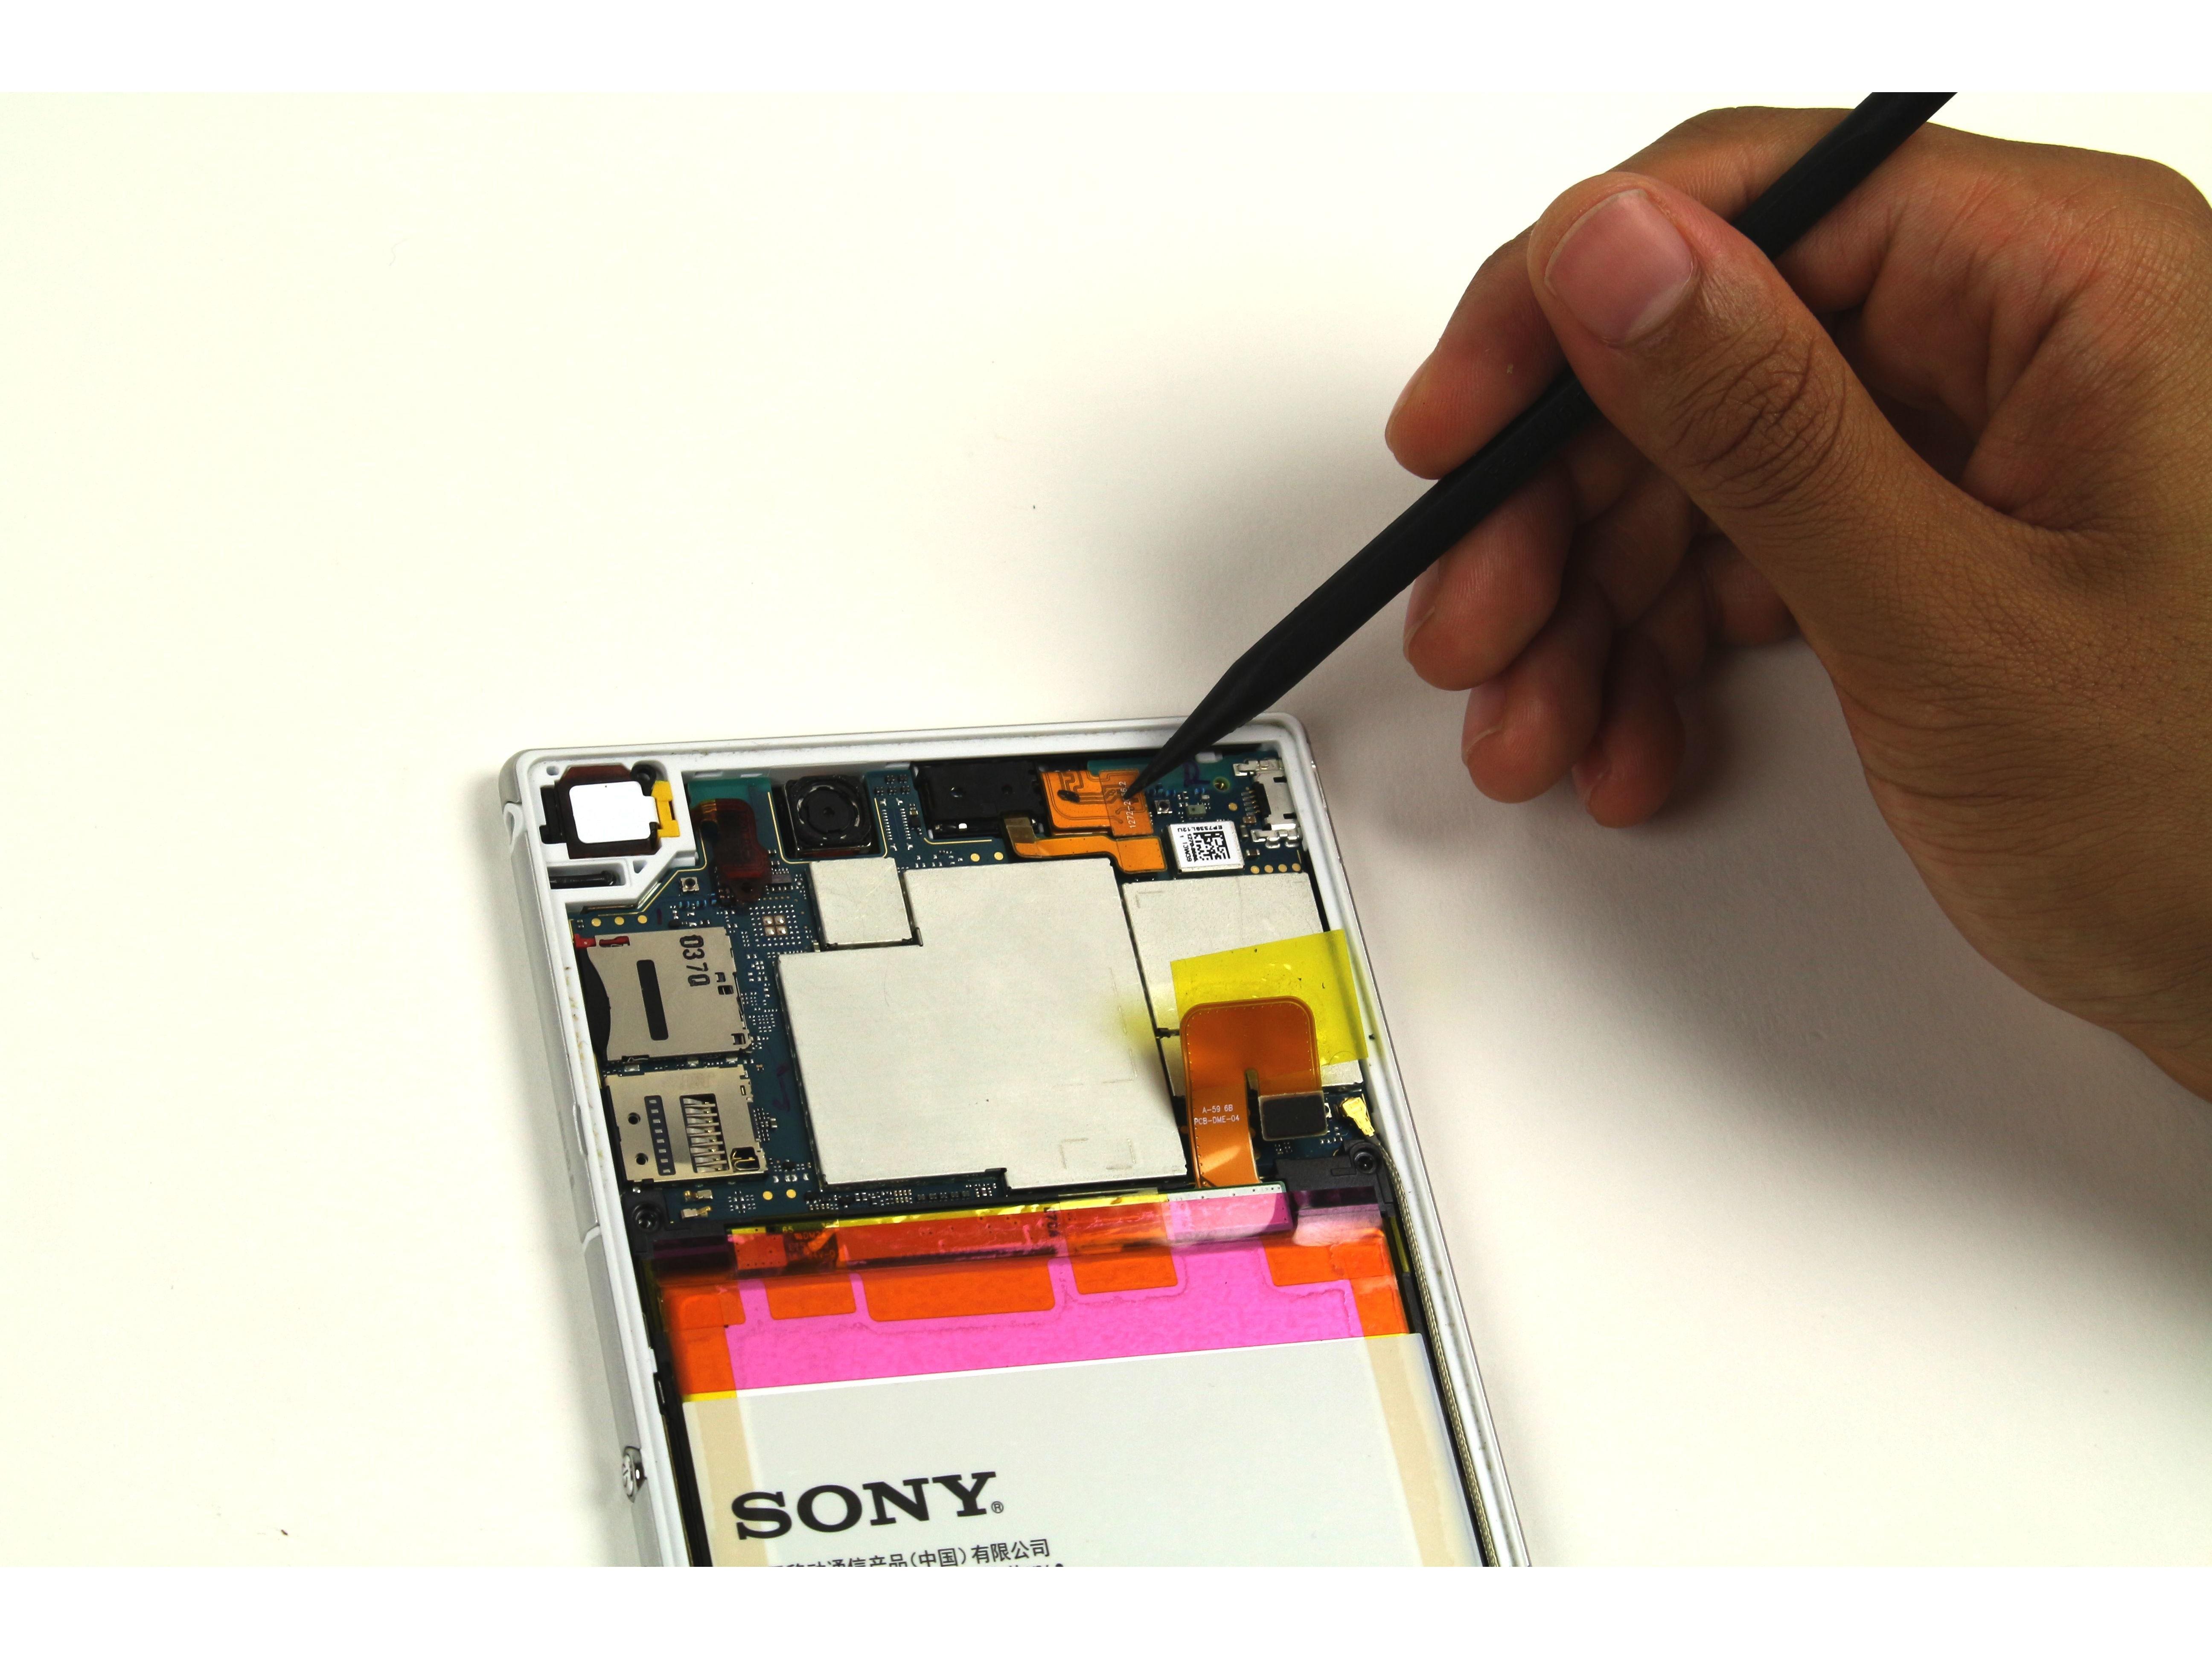 sony xperia z ultra repair ifixit rh ifixit com Sony User Manuals Sony Remote